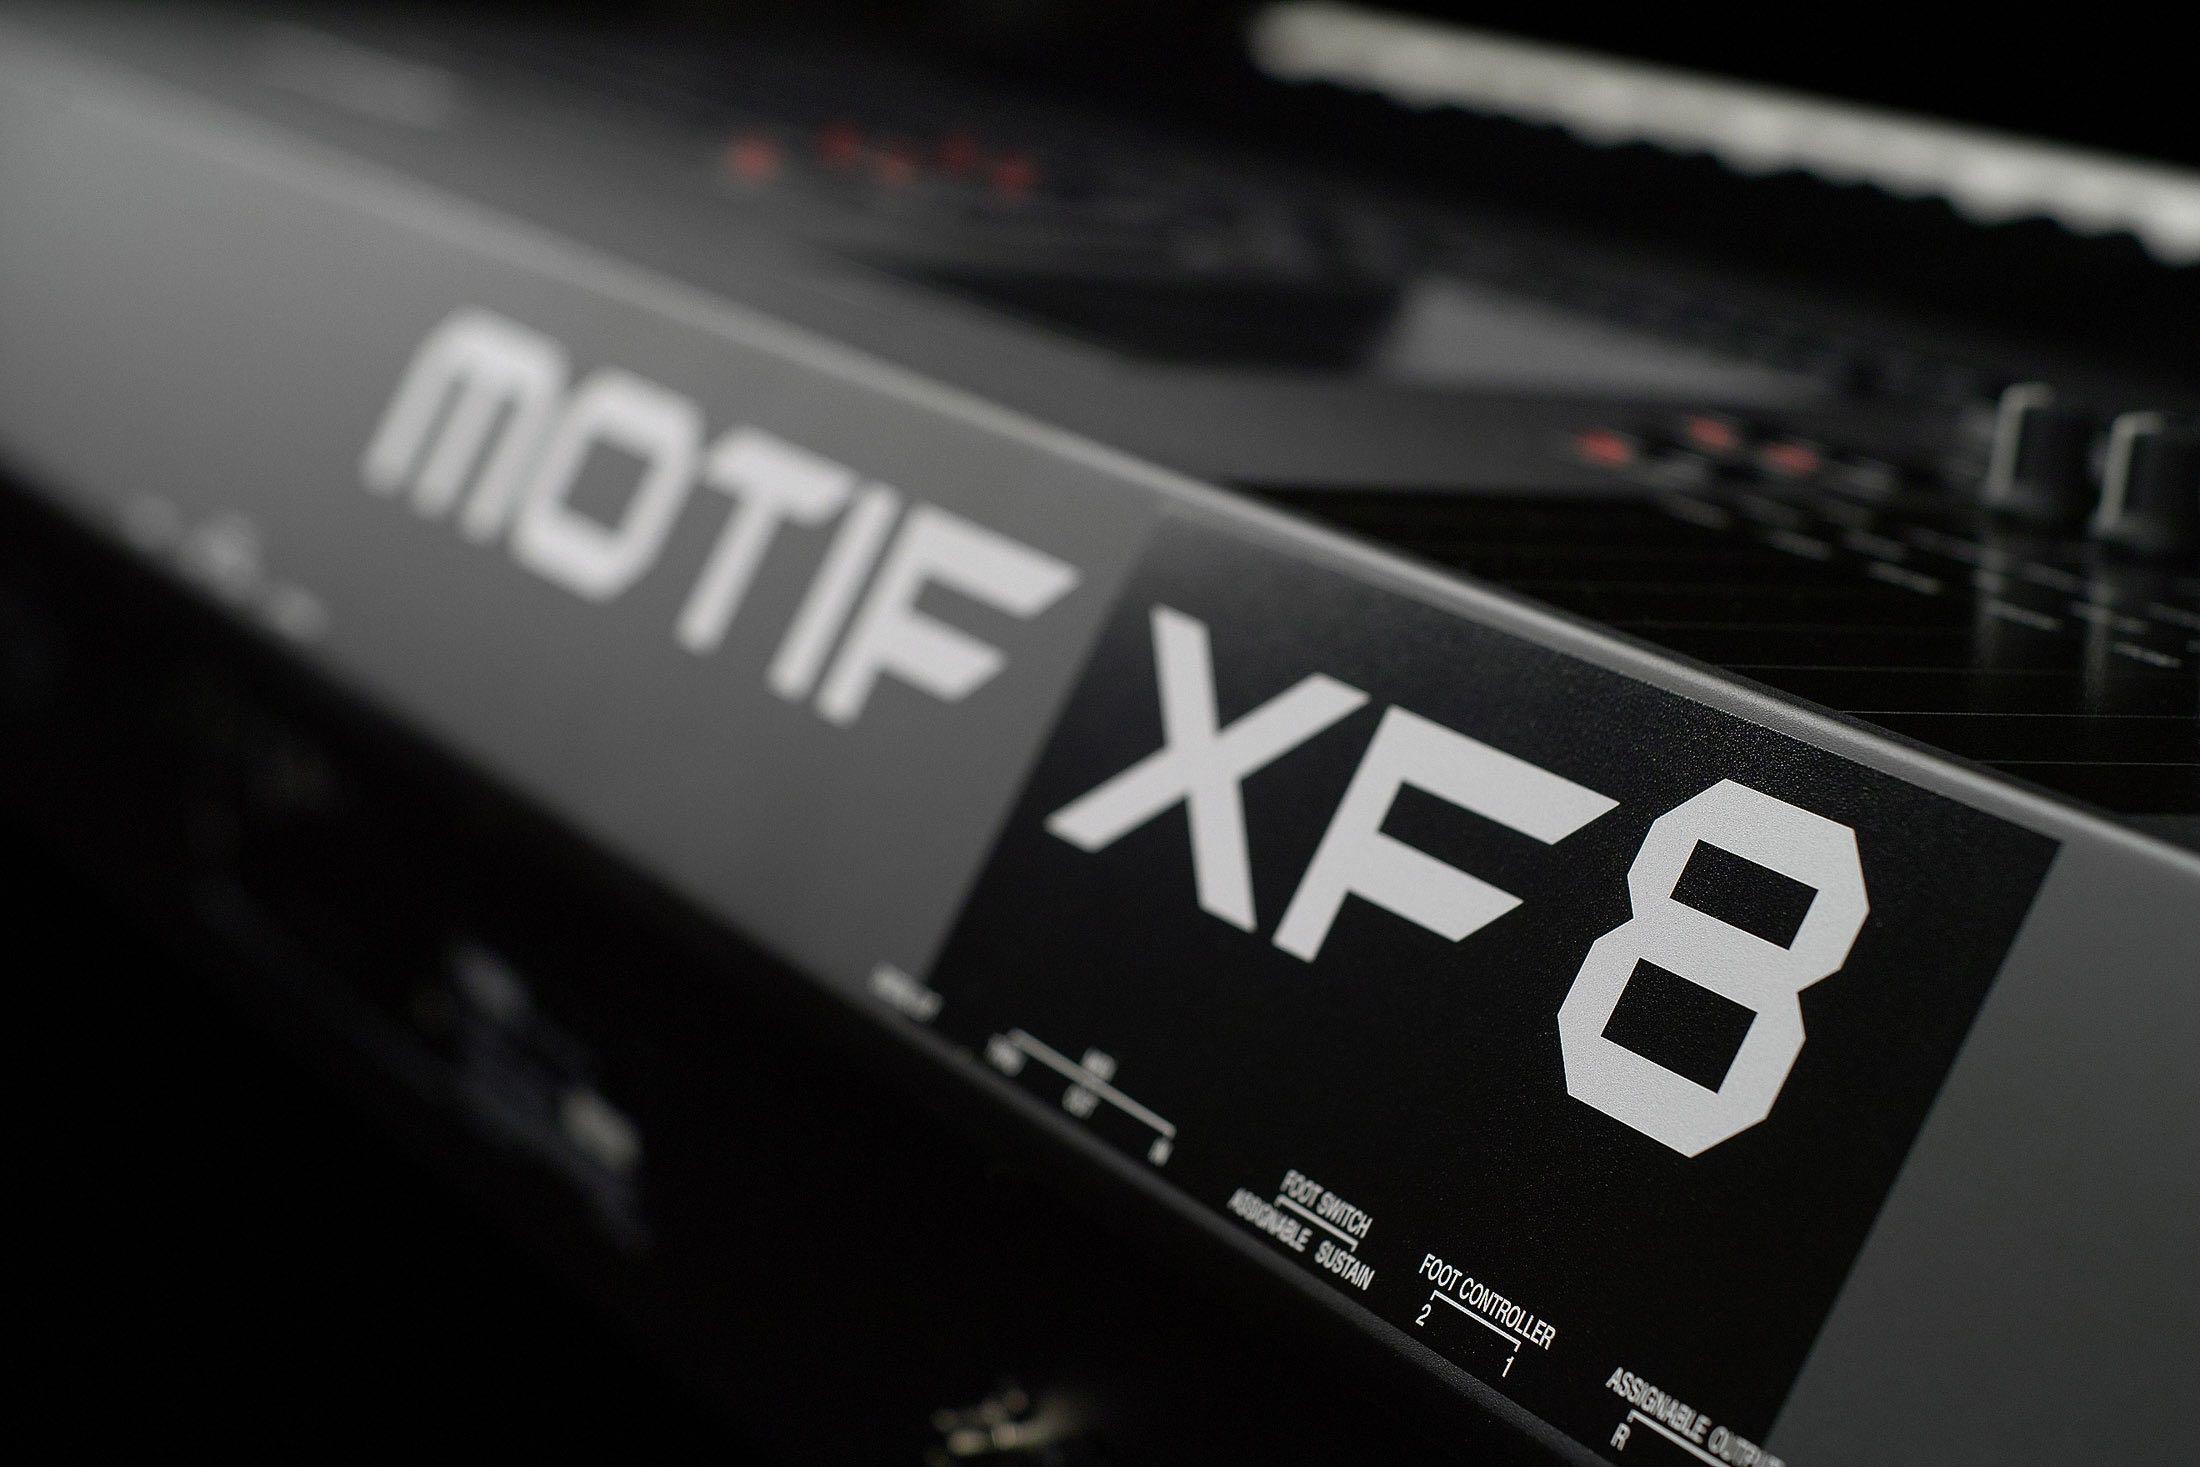 motif_xf8_kronos-haven